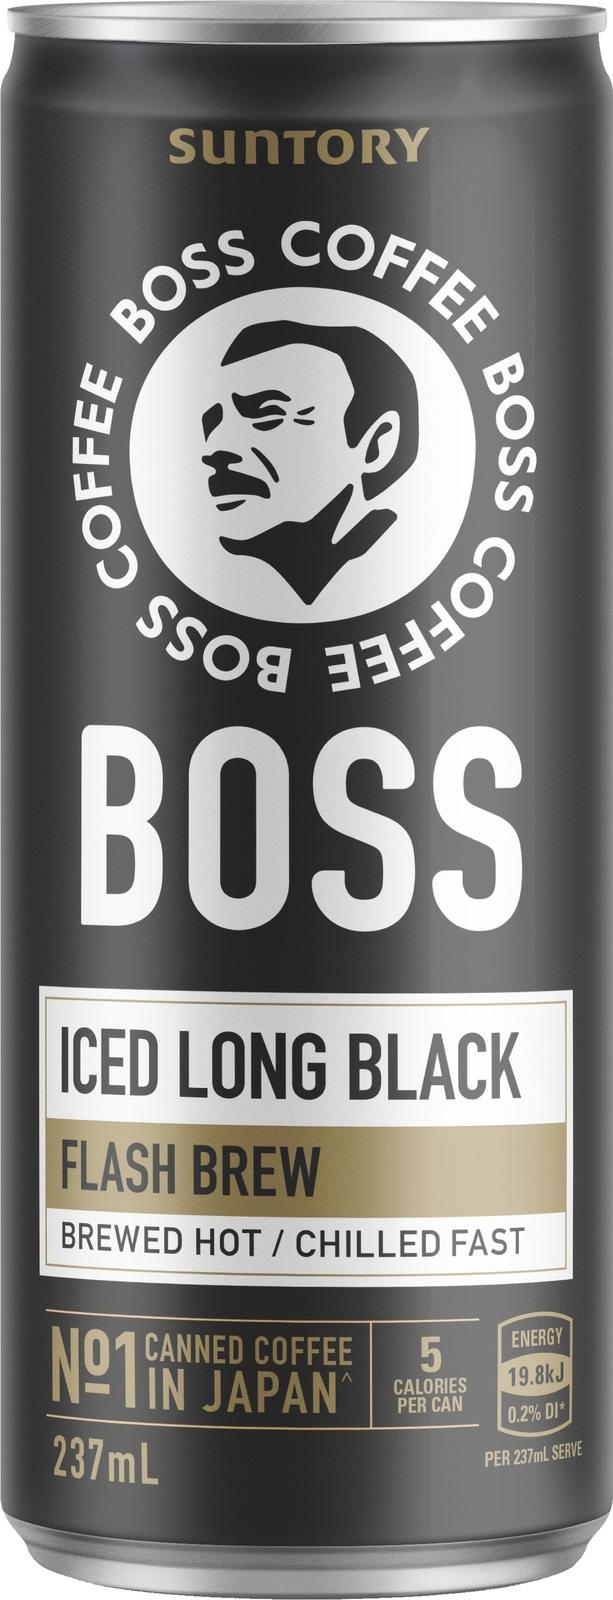 Suntory Boss Long Black Coffee (12 Pack) image